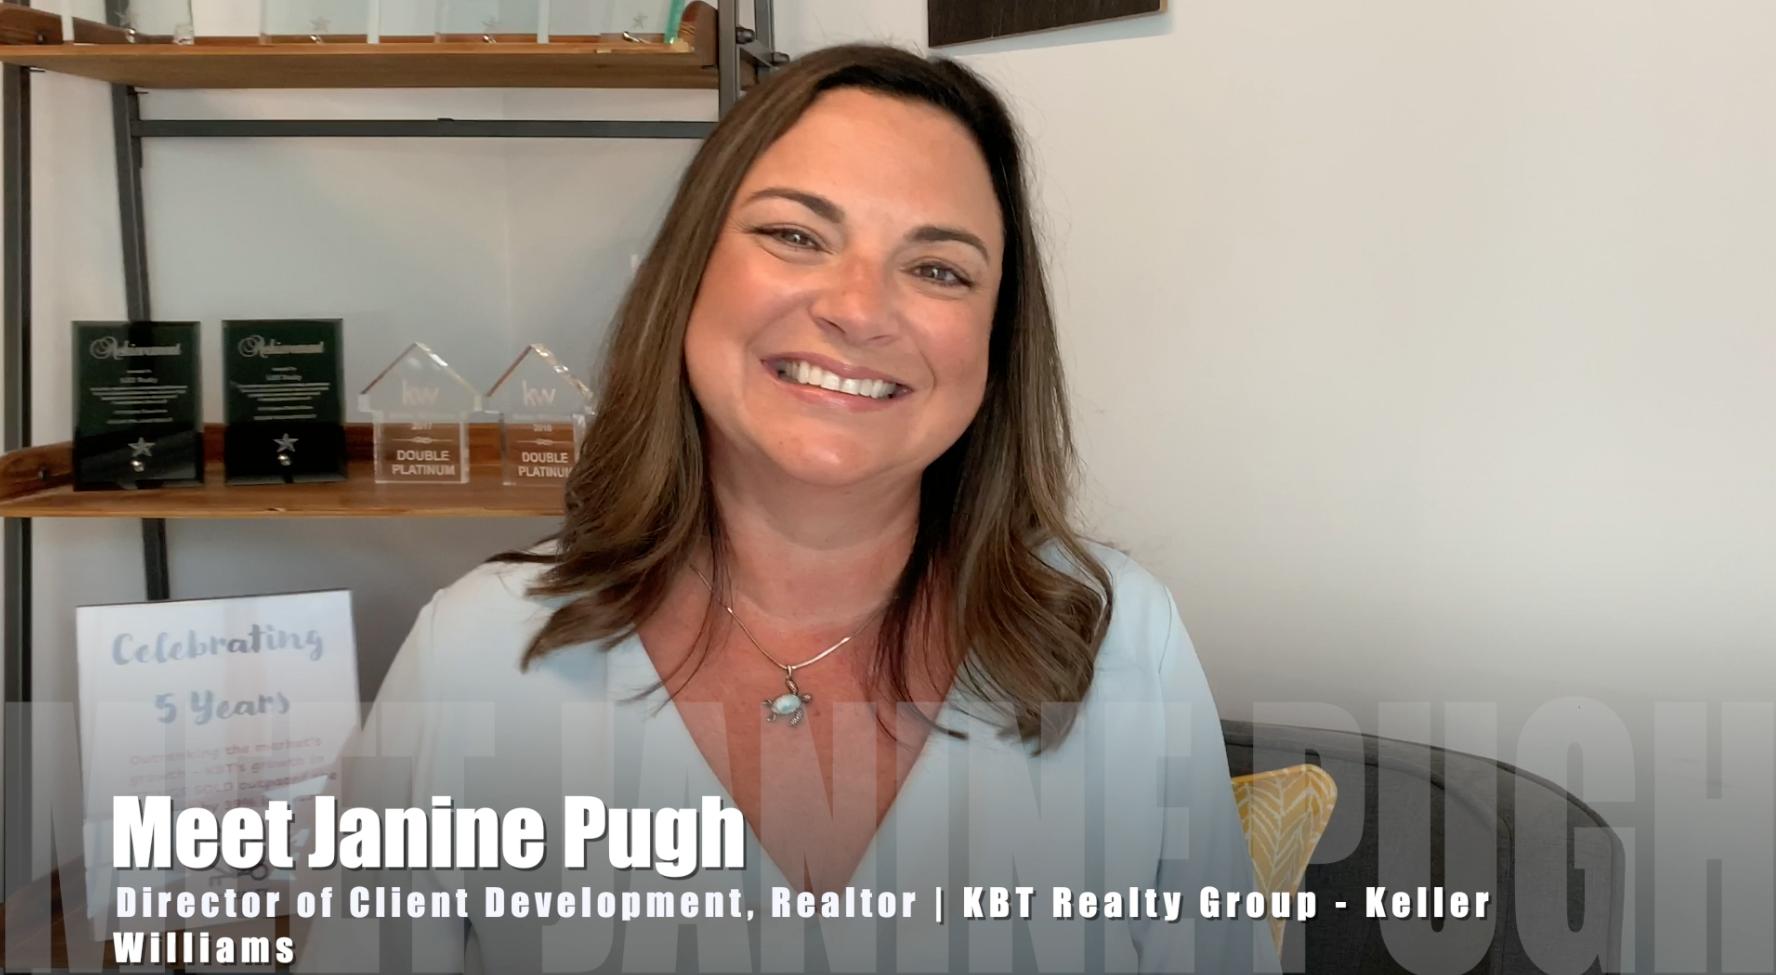 Janine Pugh, Director of Client Development for KBT Realty Group | Meet the Broker